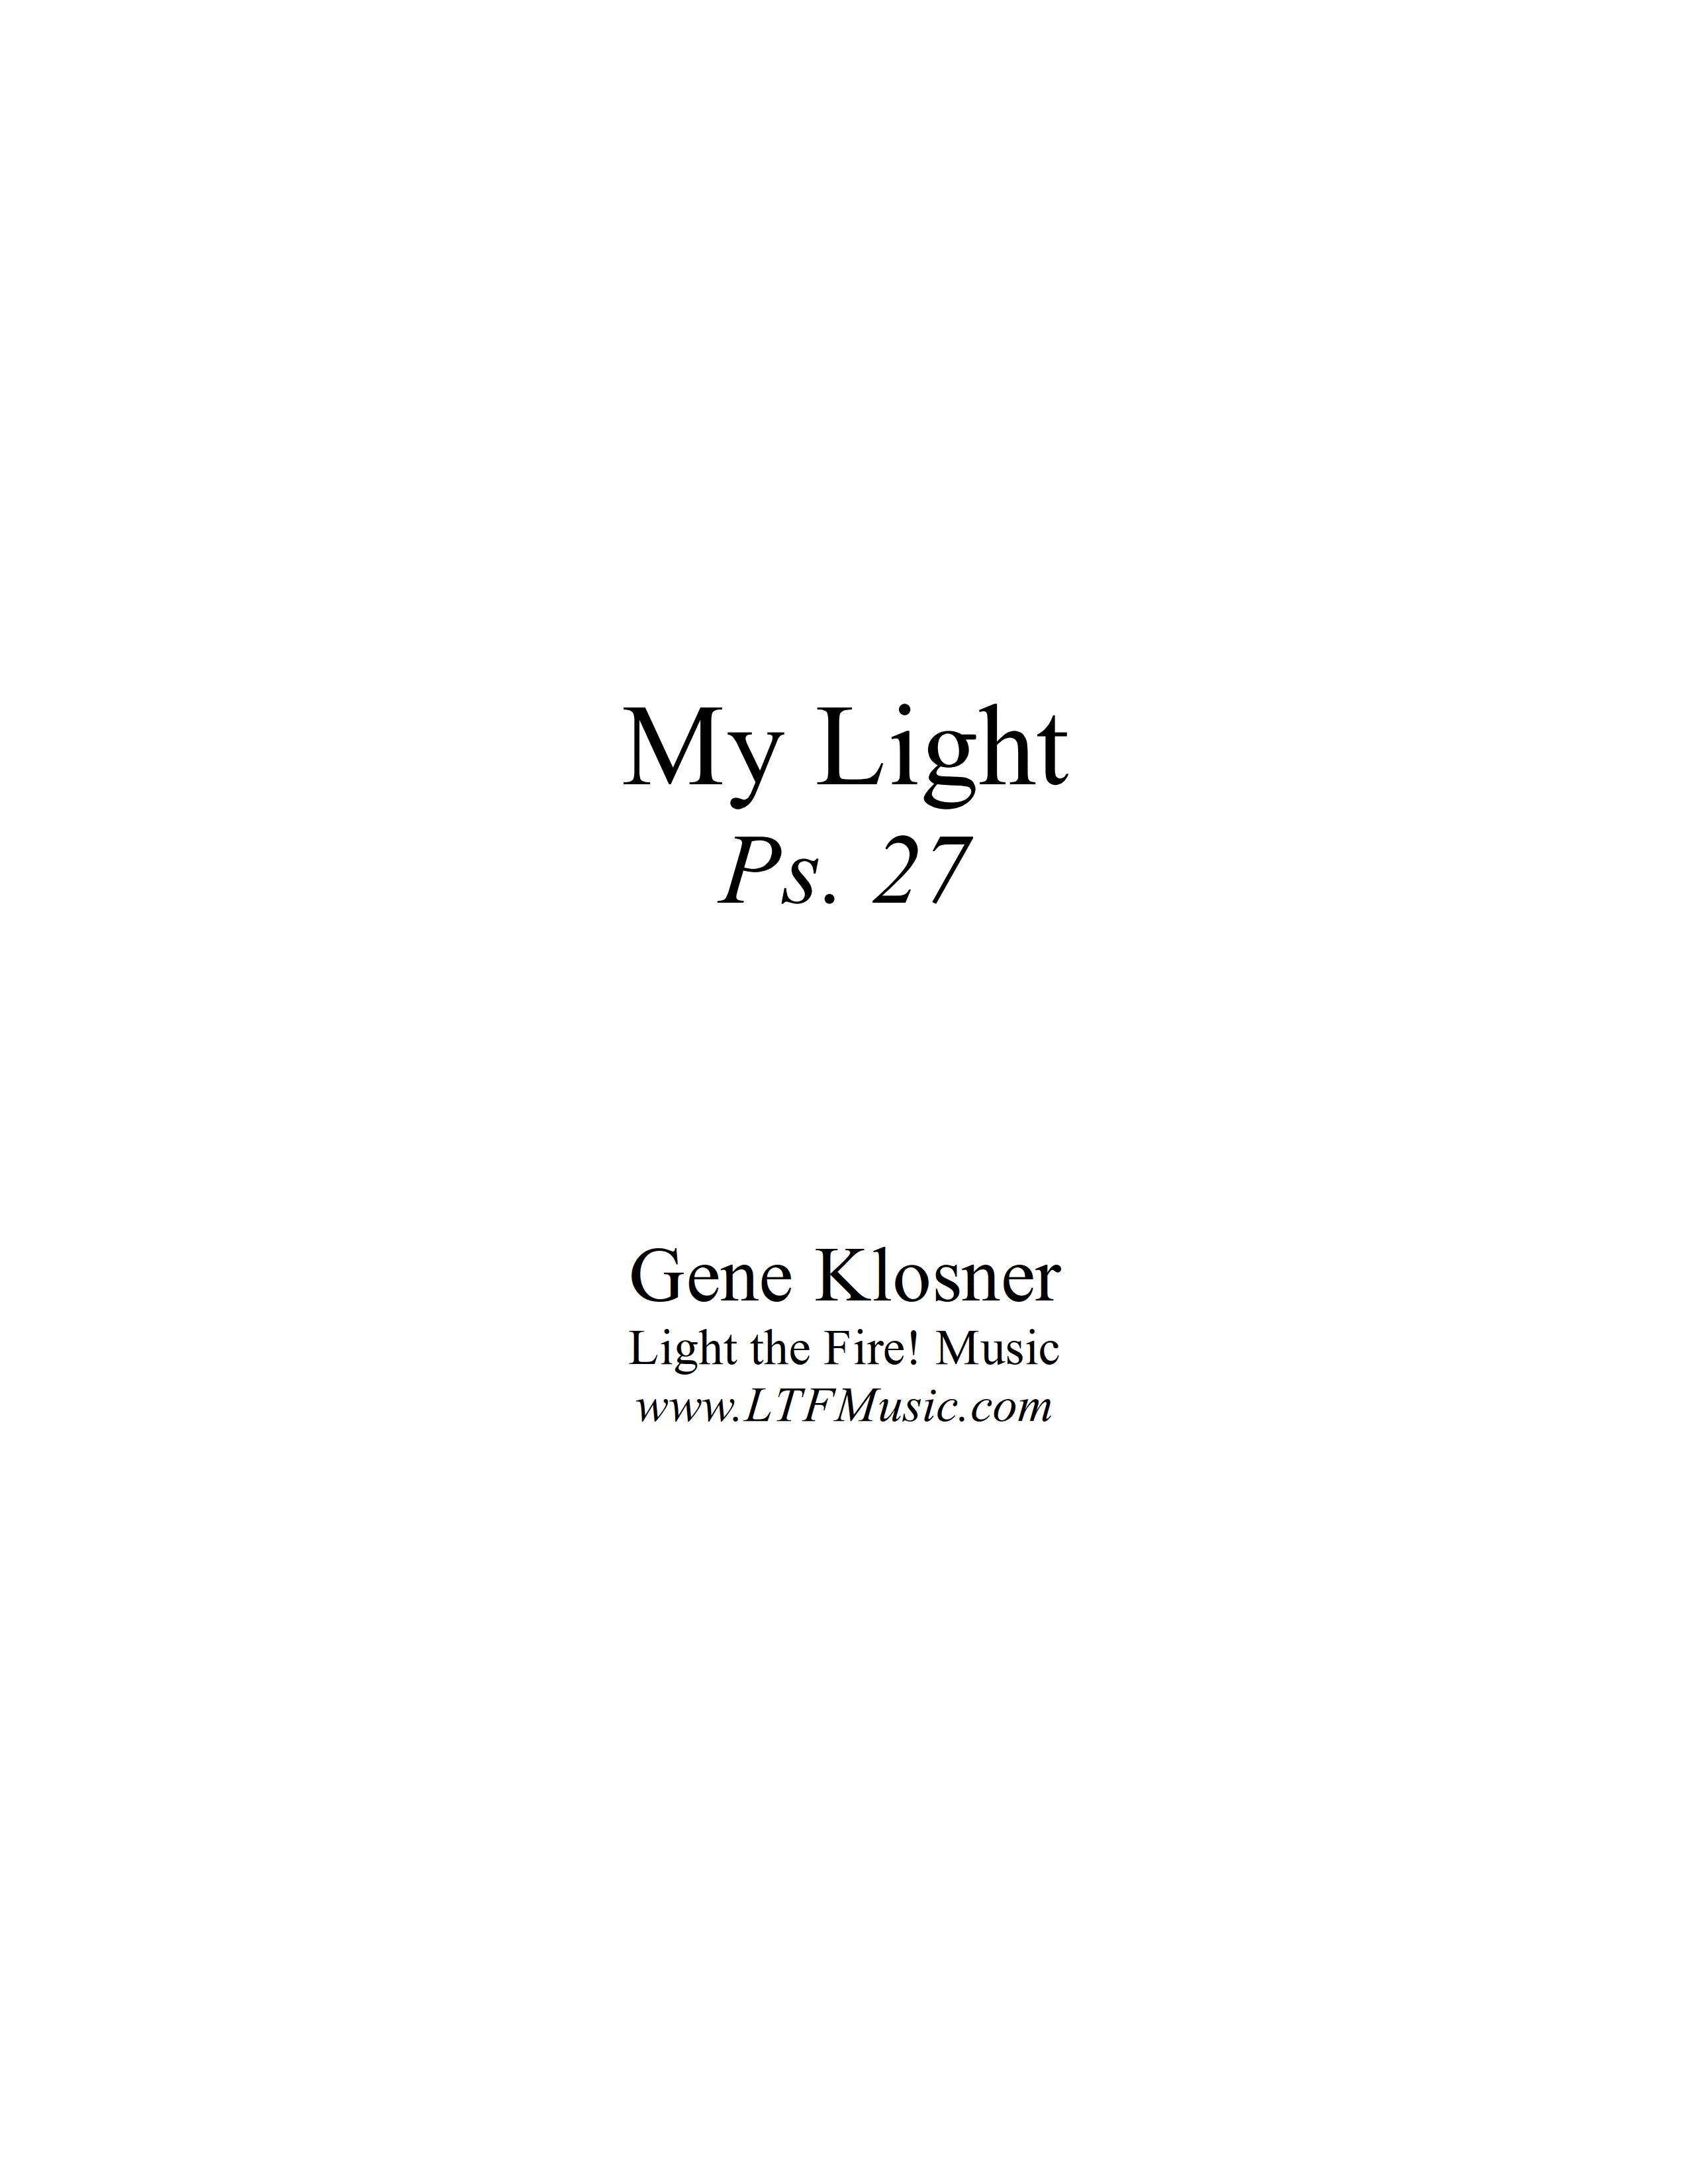 My Light CompletePDF 1 png